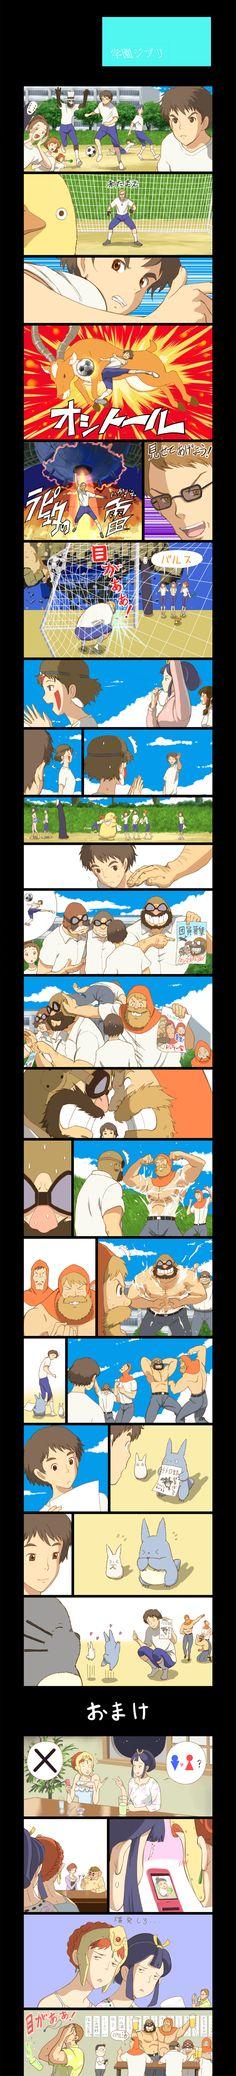 Studio Ghibli Crossover